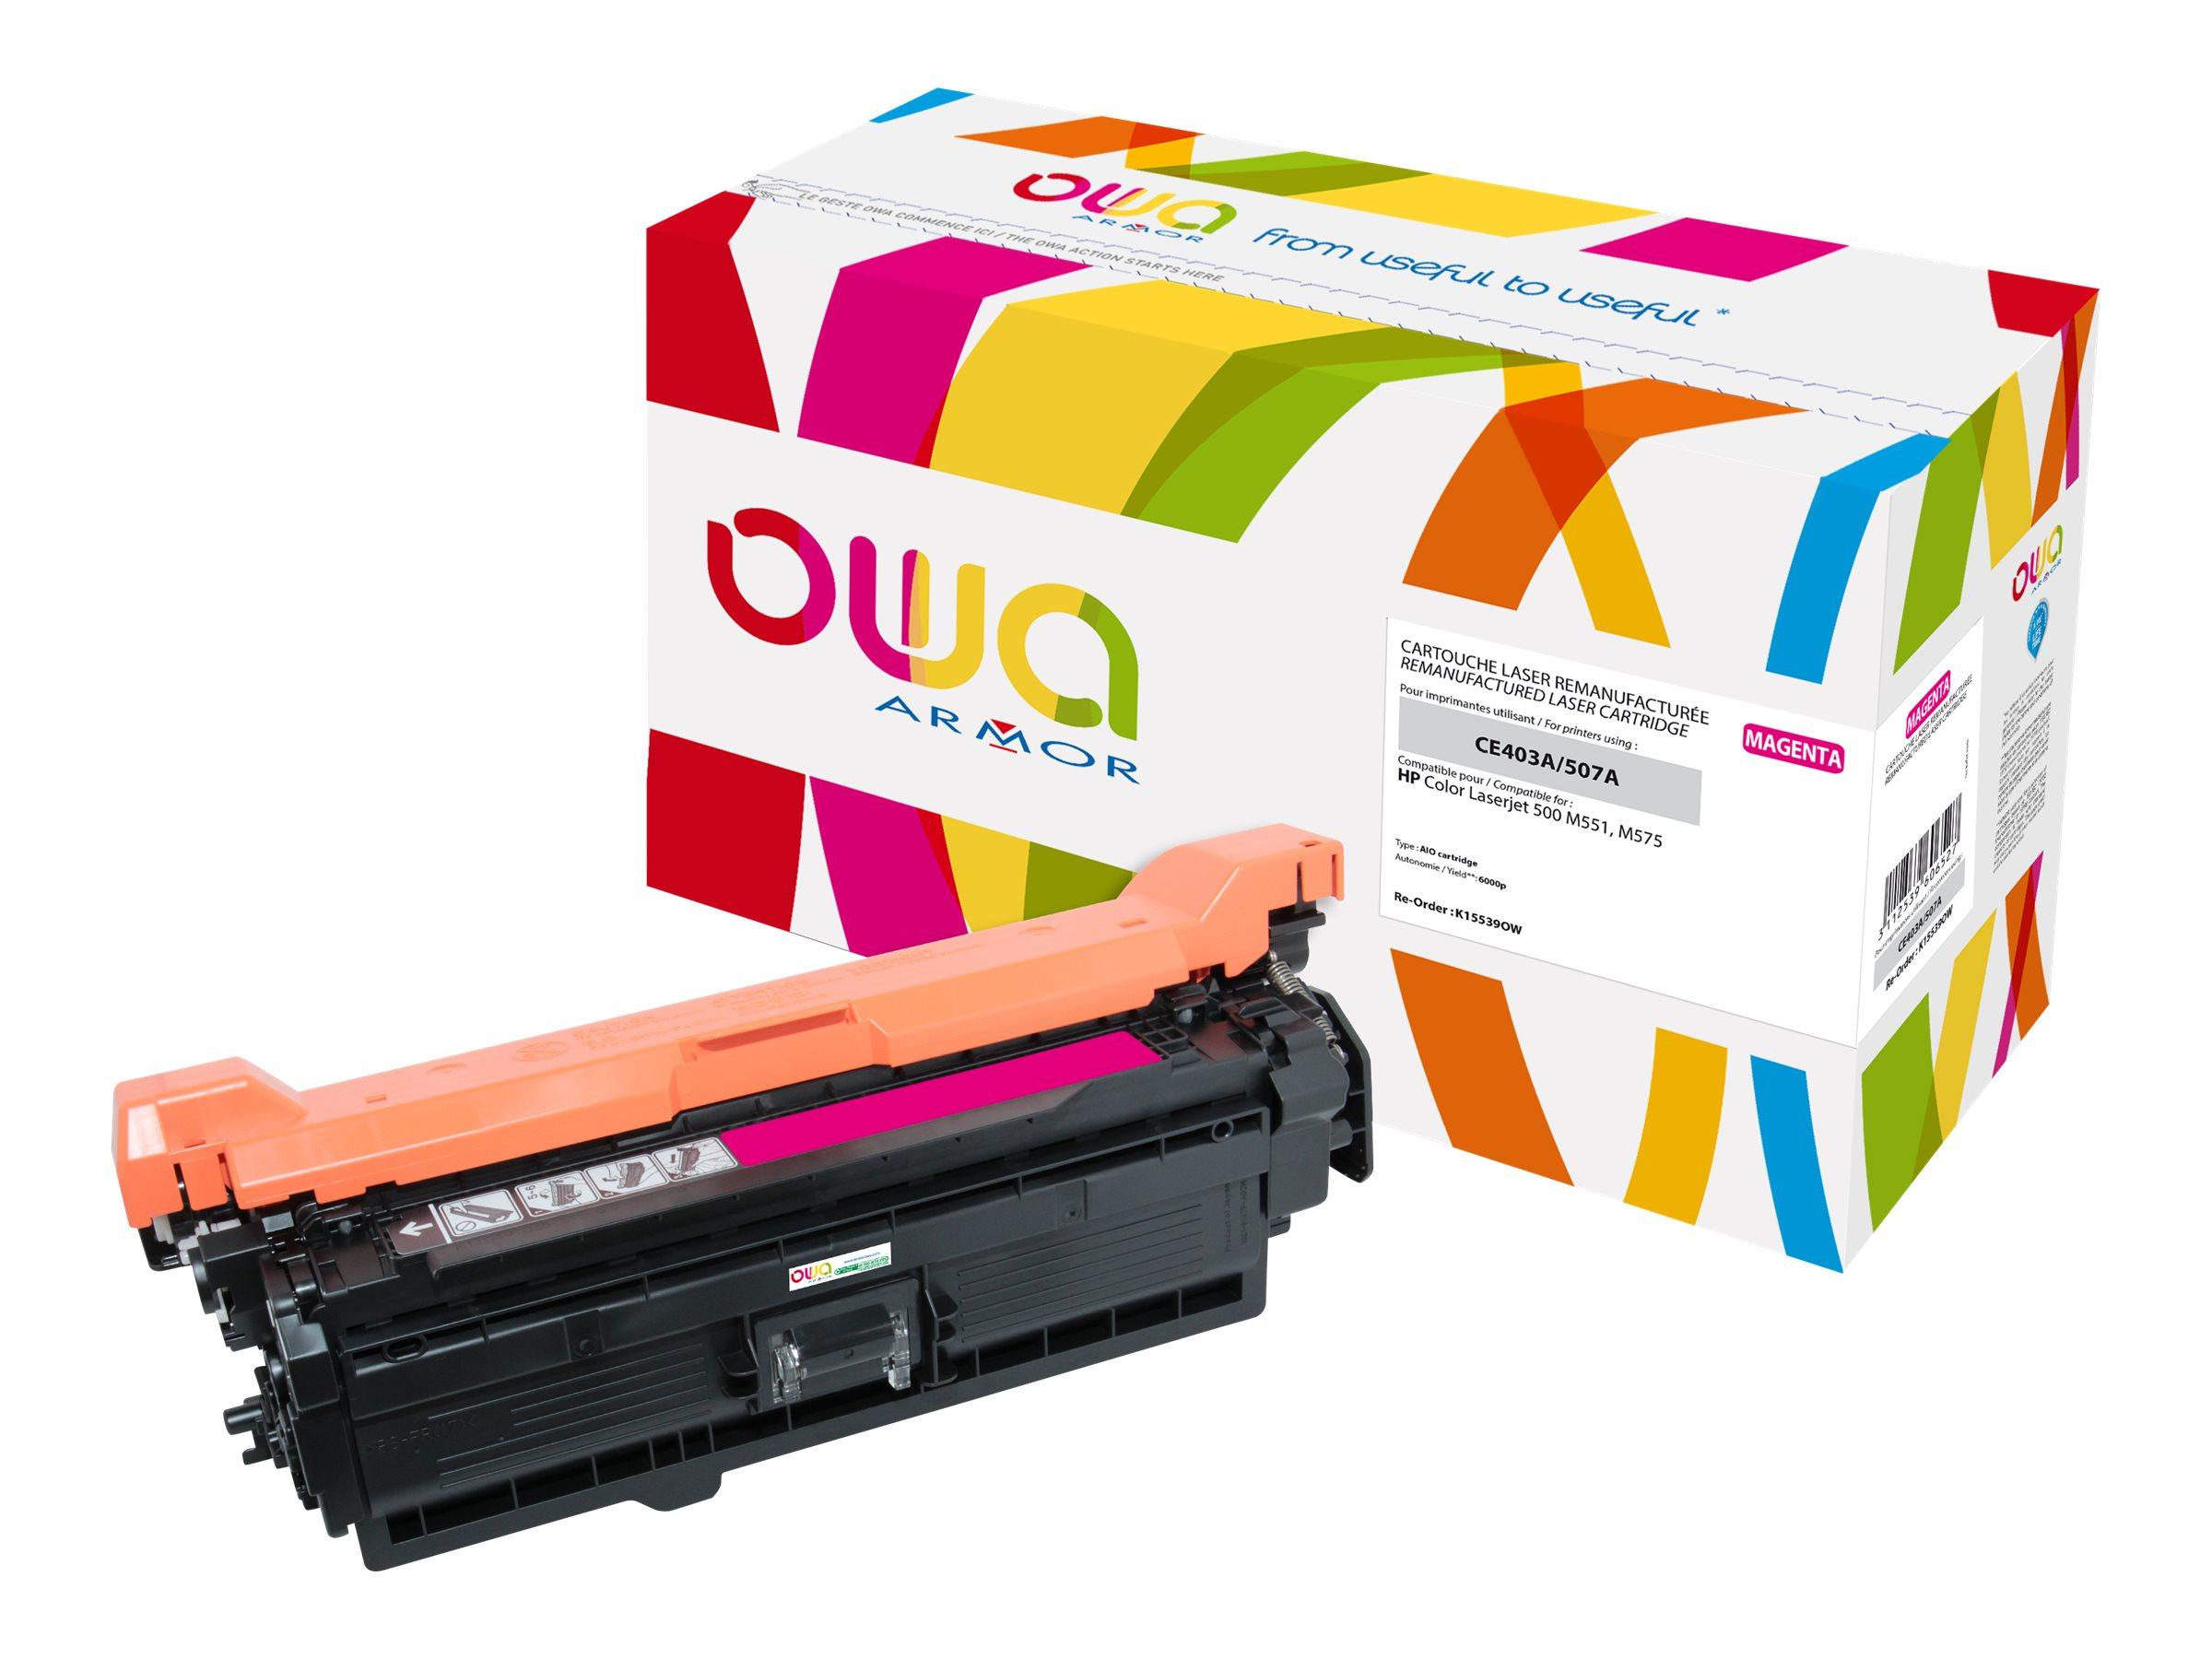 HP 507A - remanufacturé Owa K15539OW - magenta - cartouche laser